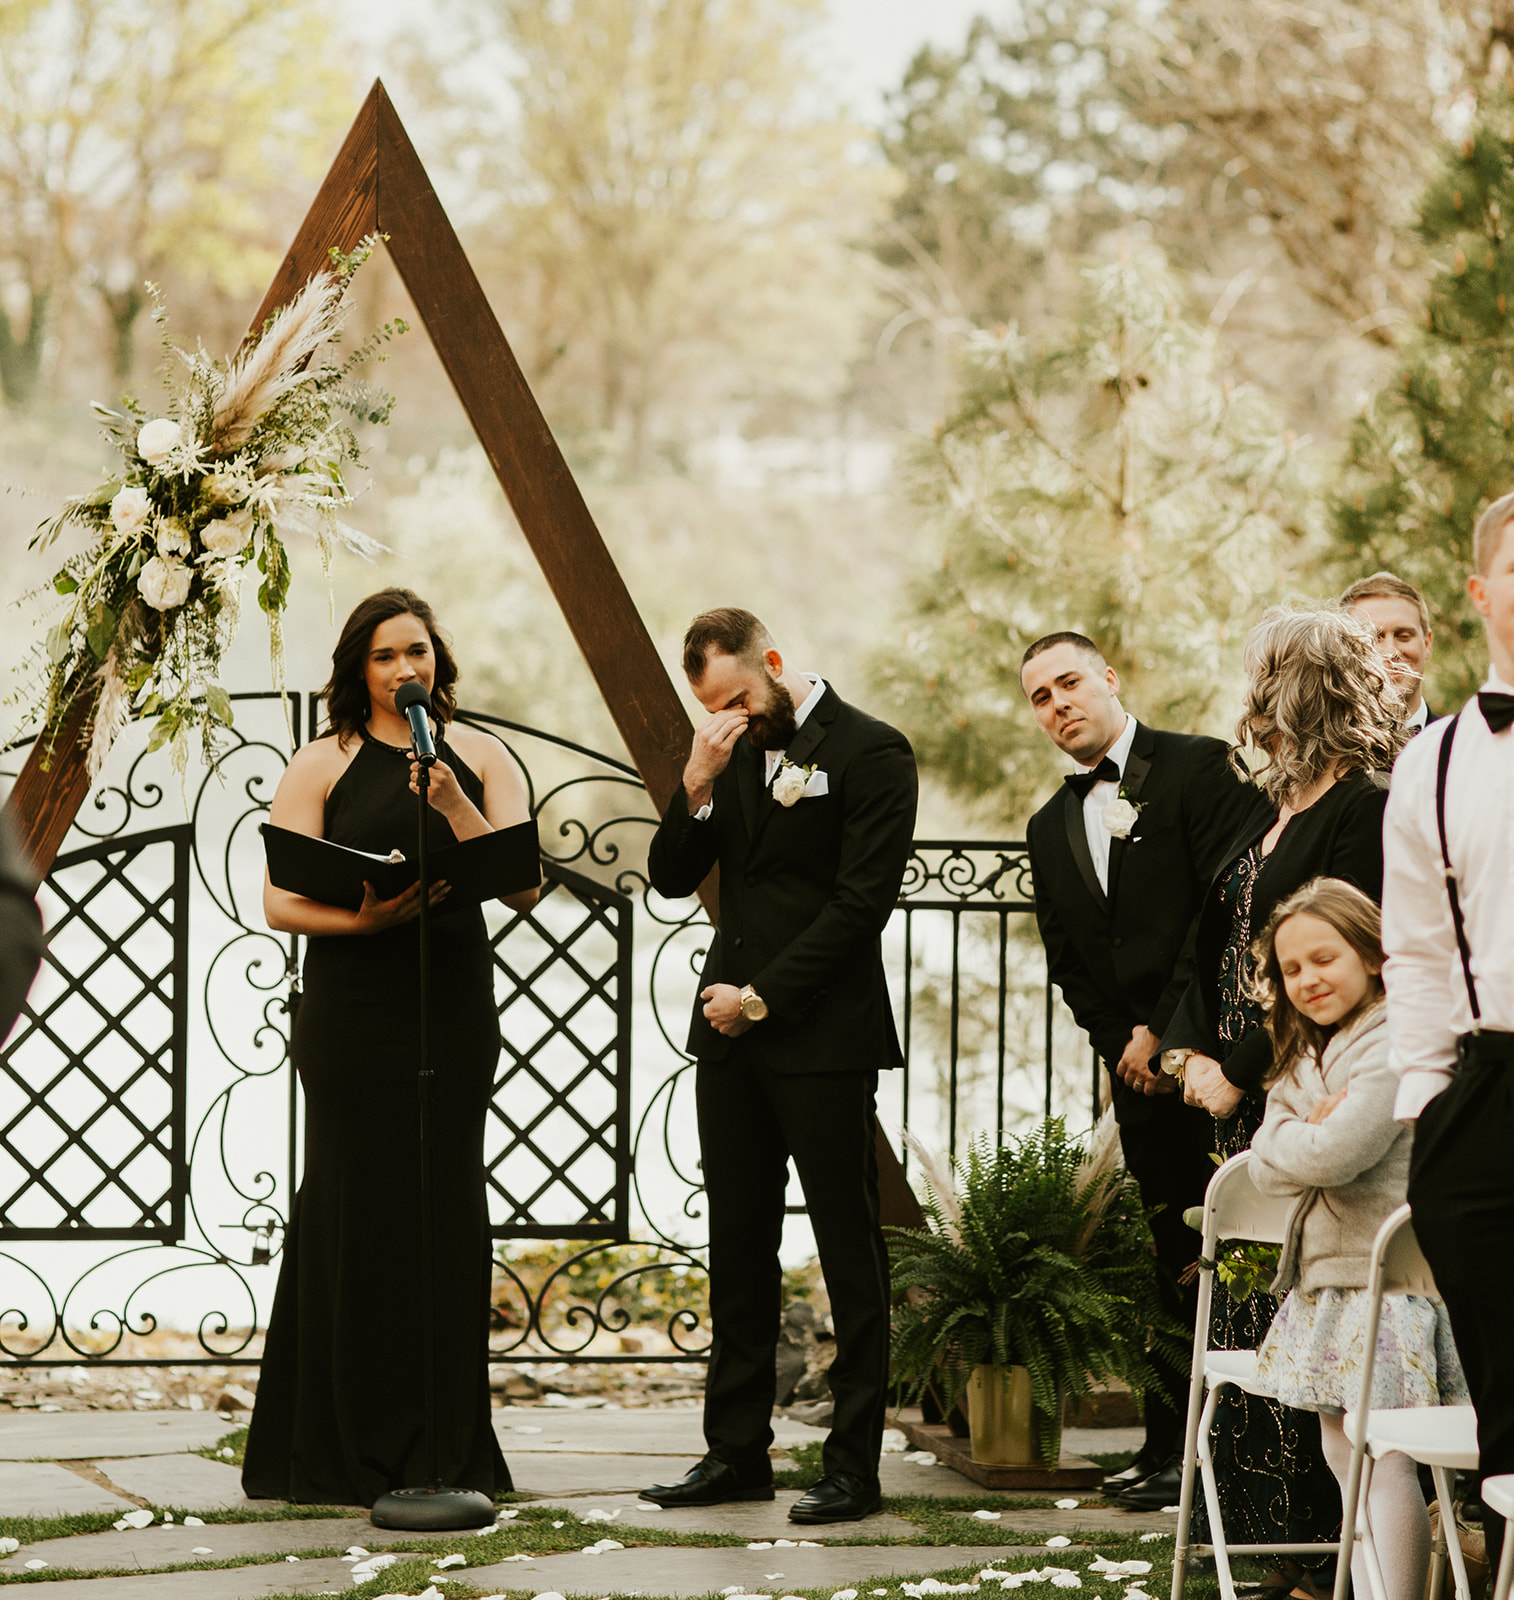 Chateau Rive Spokane Wedding Spokane Blog Dress groom